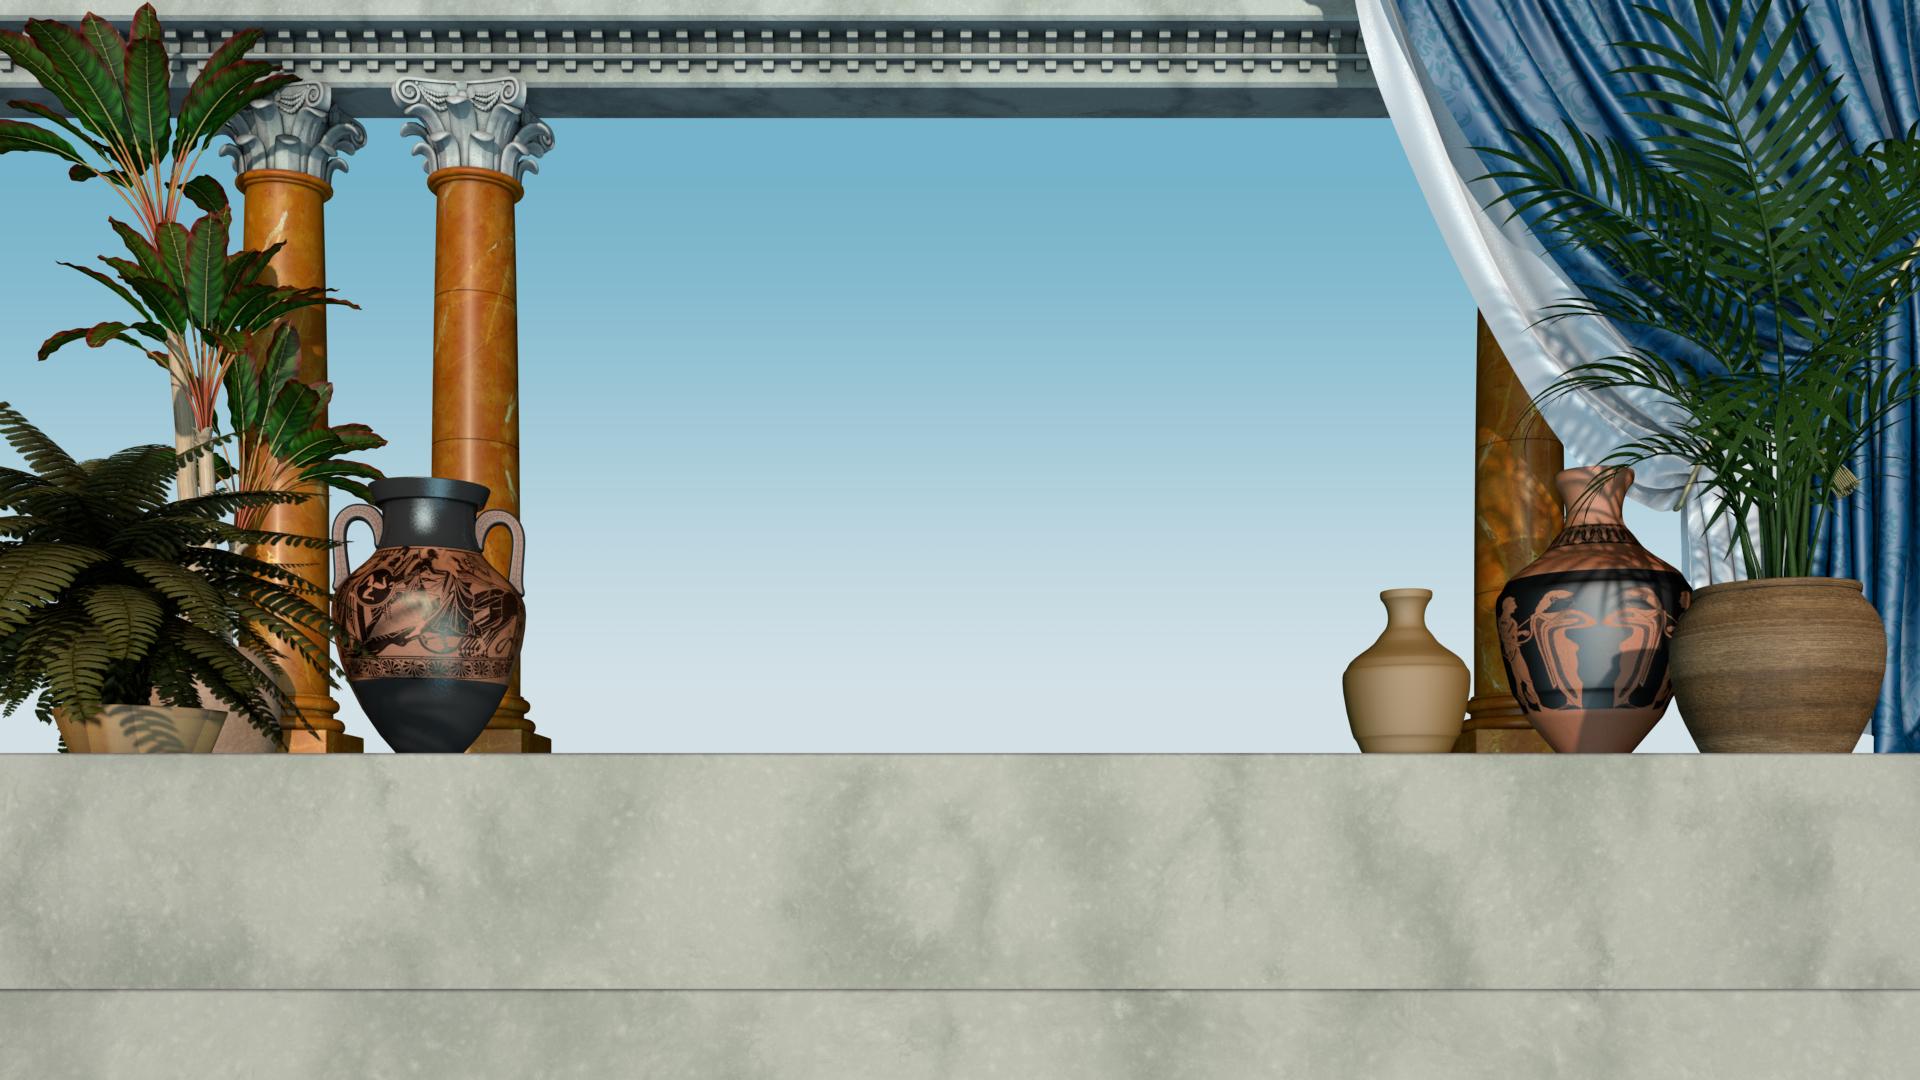 scene-11-raw-image